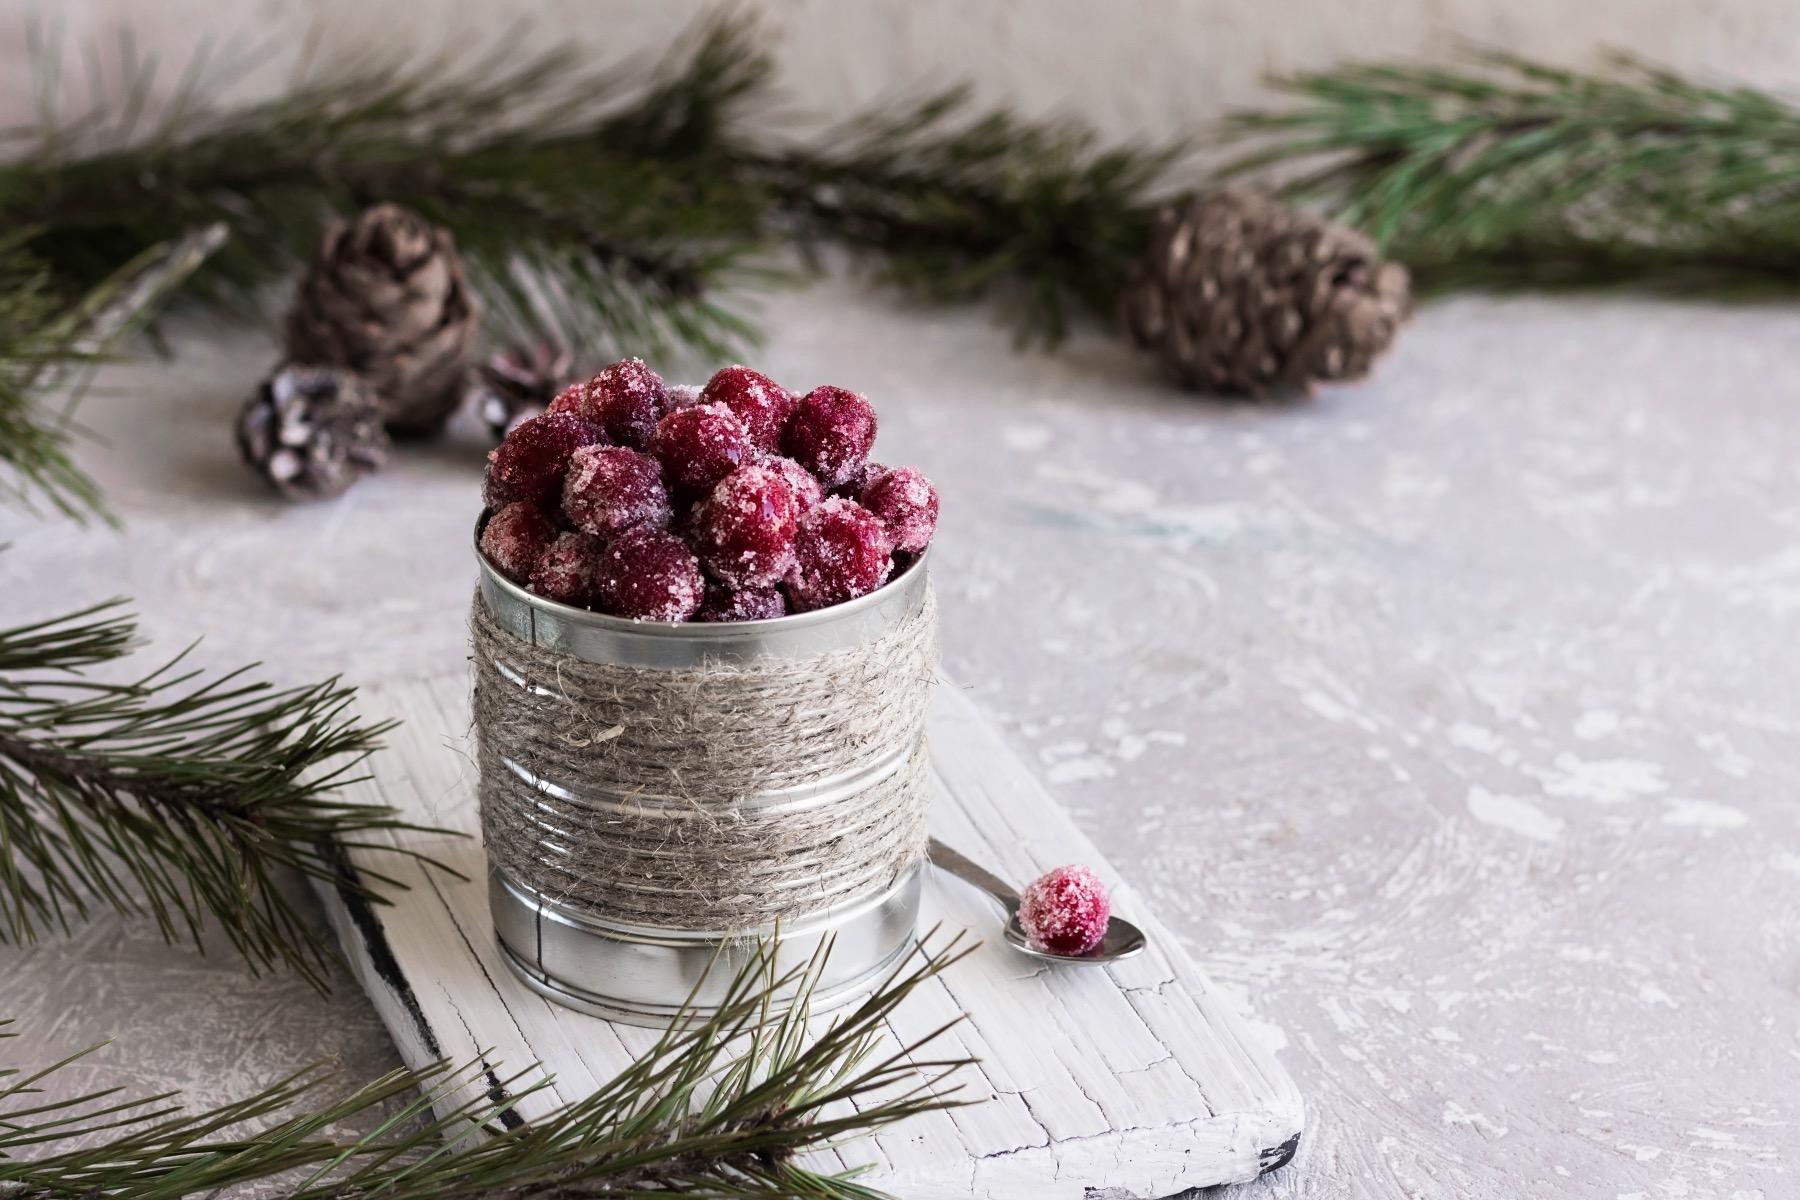 recipe for homemade sugared cranberries pop shop america